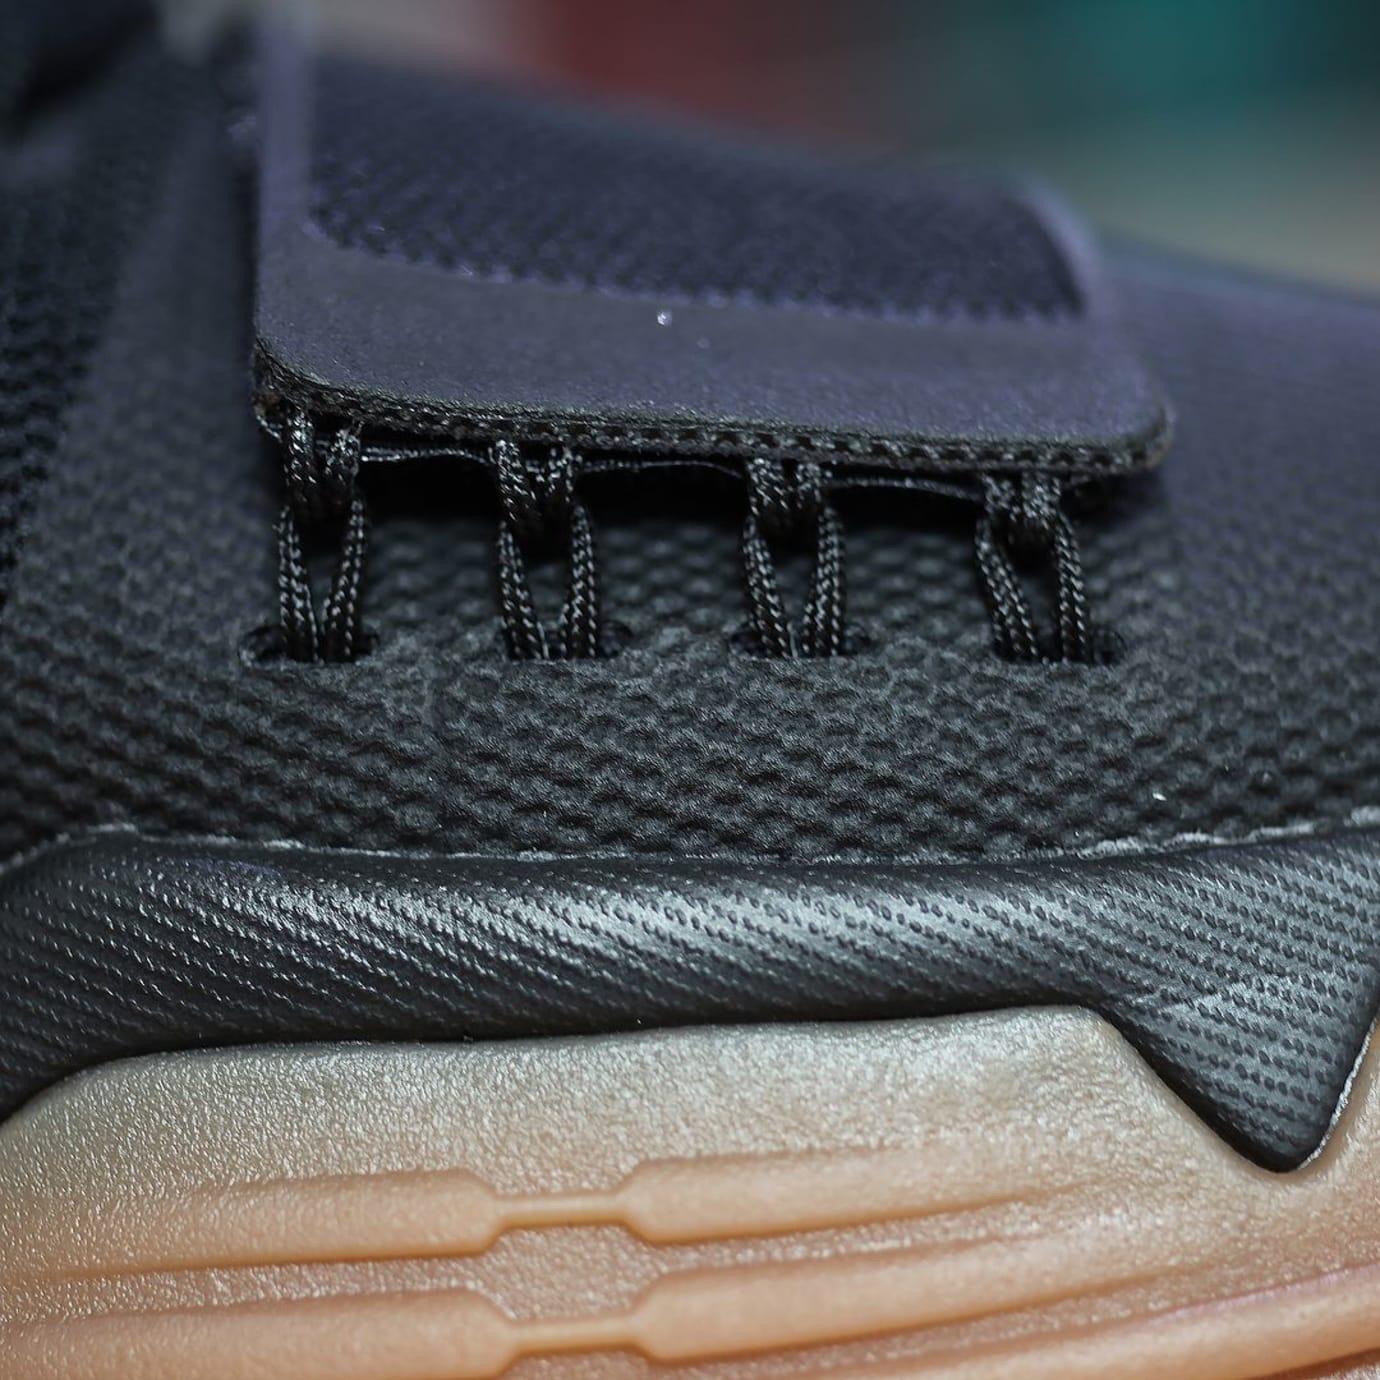 Nike PG1 Black Gum Release Date 878627-004 (9)